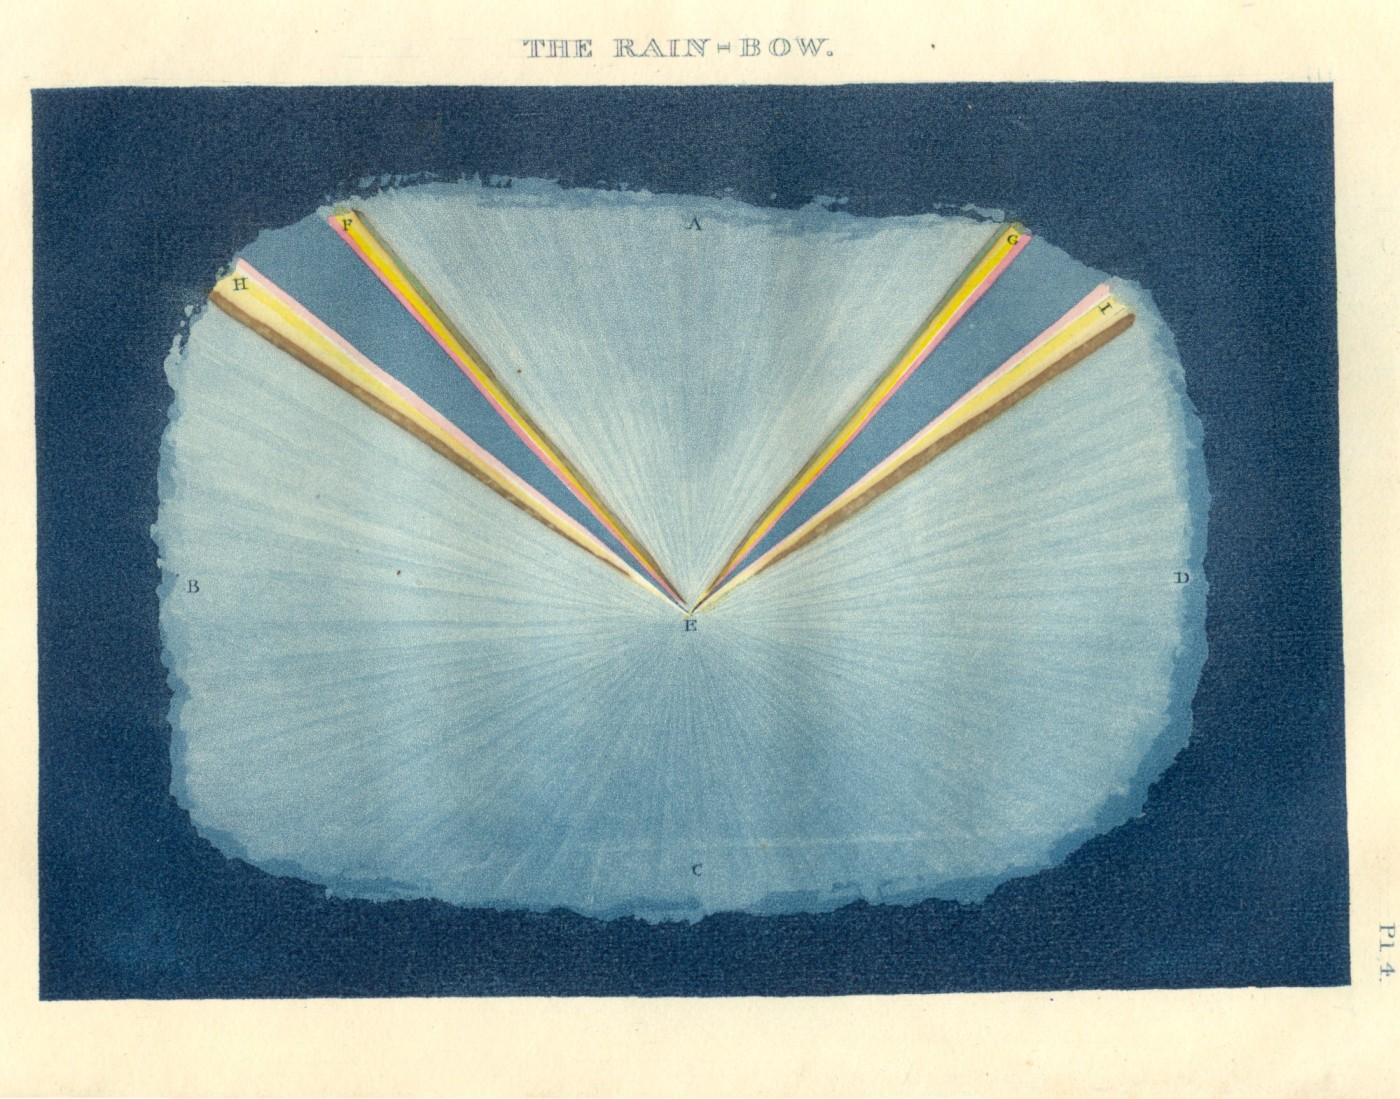 Rainbow Ainger 1830